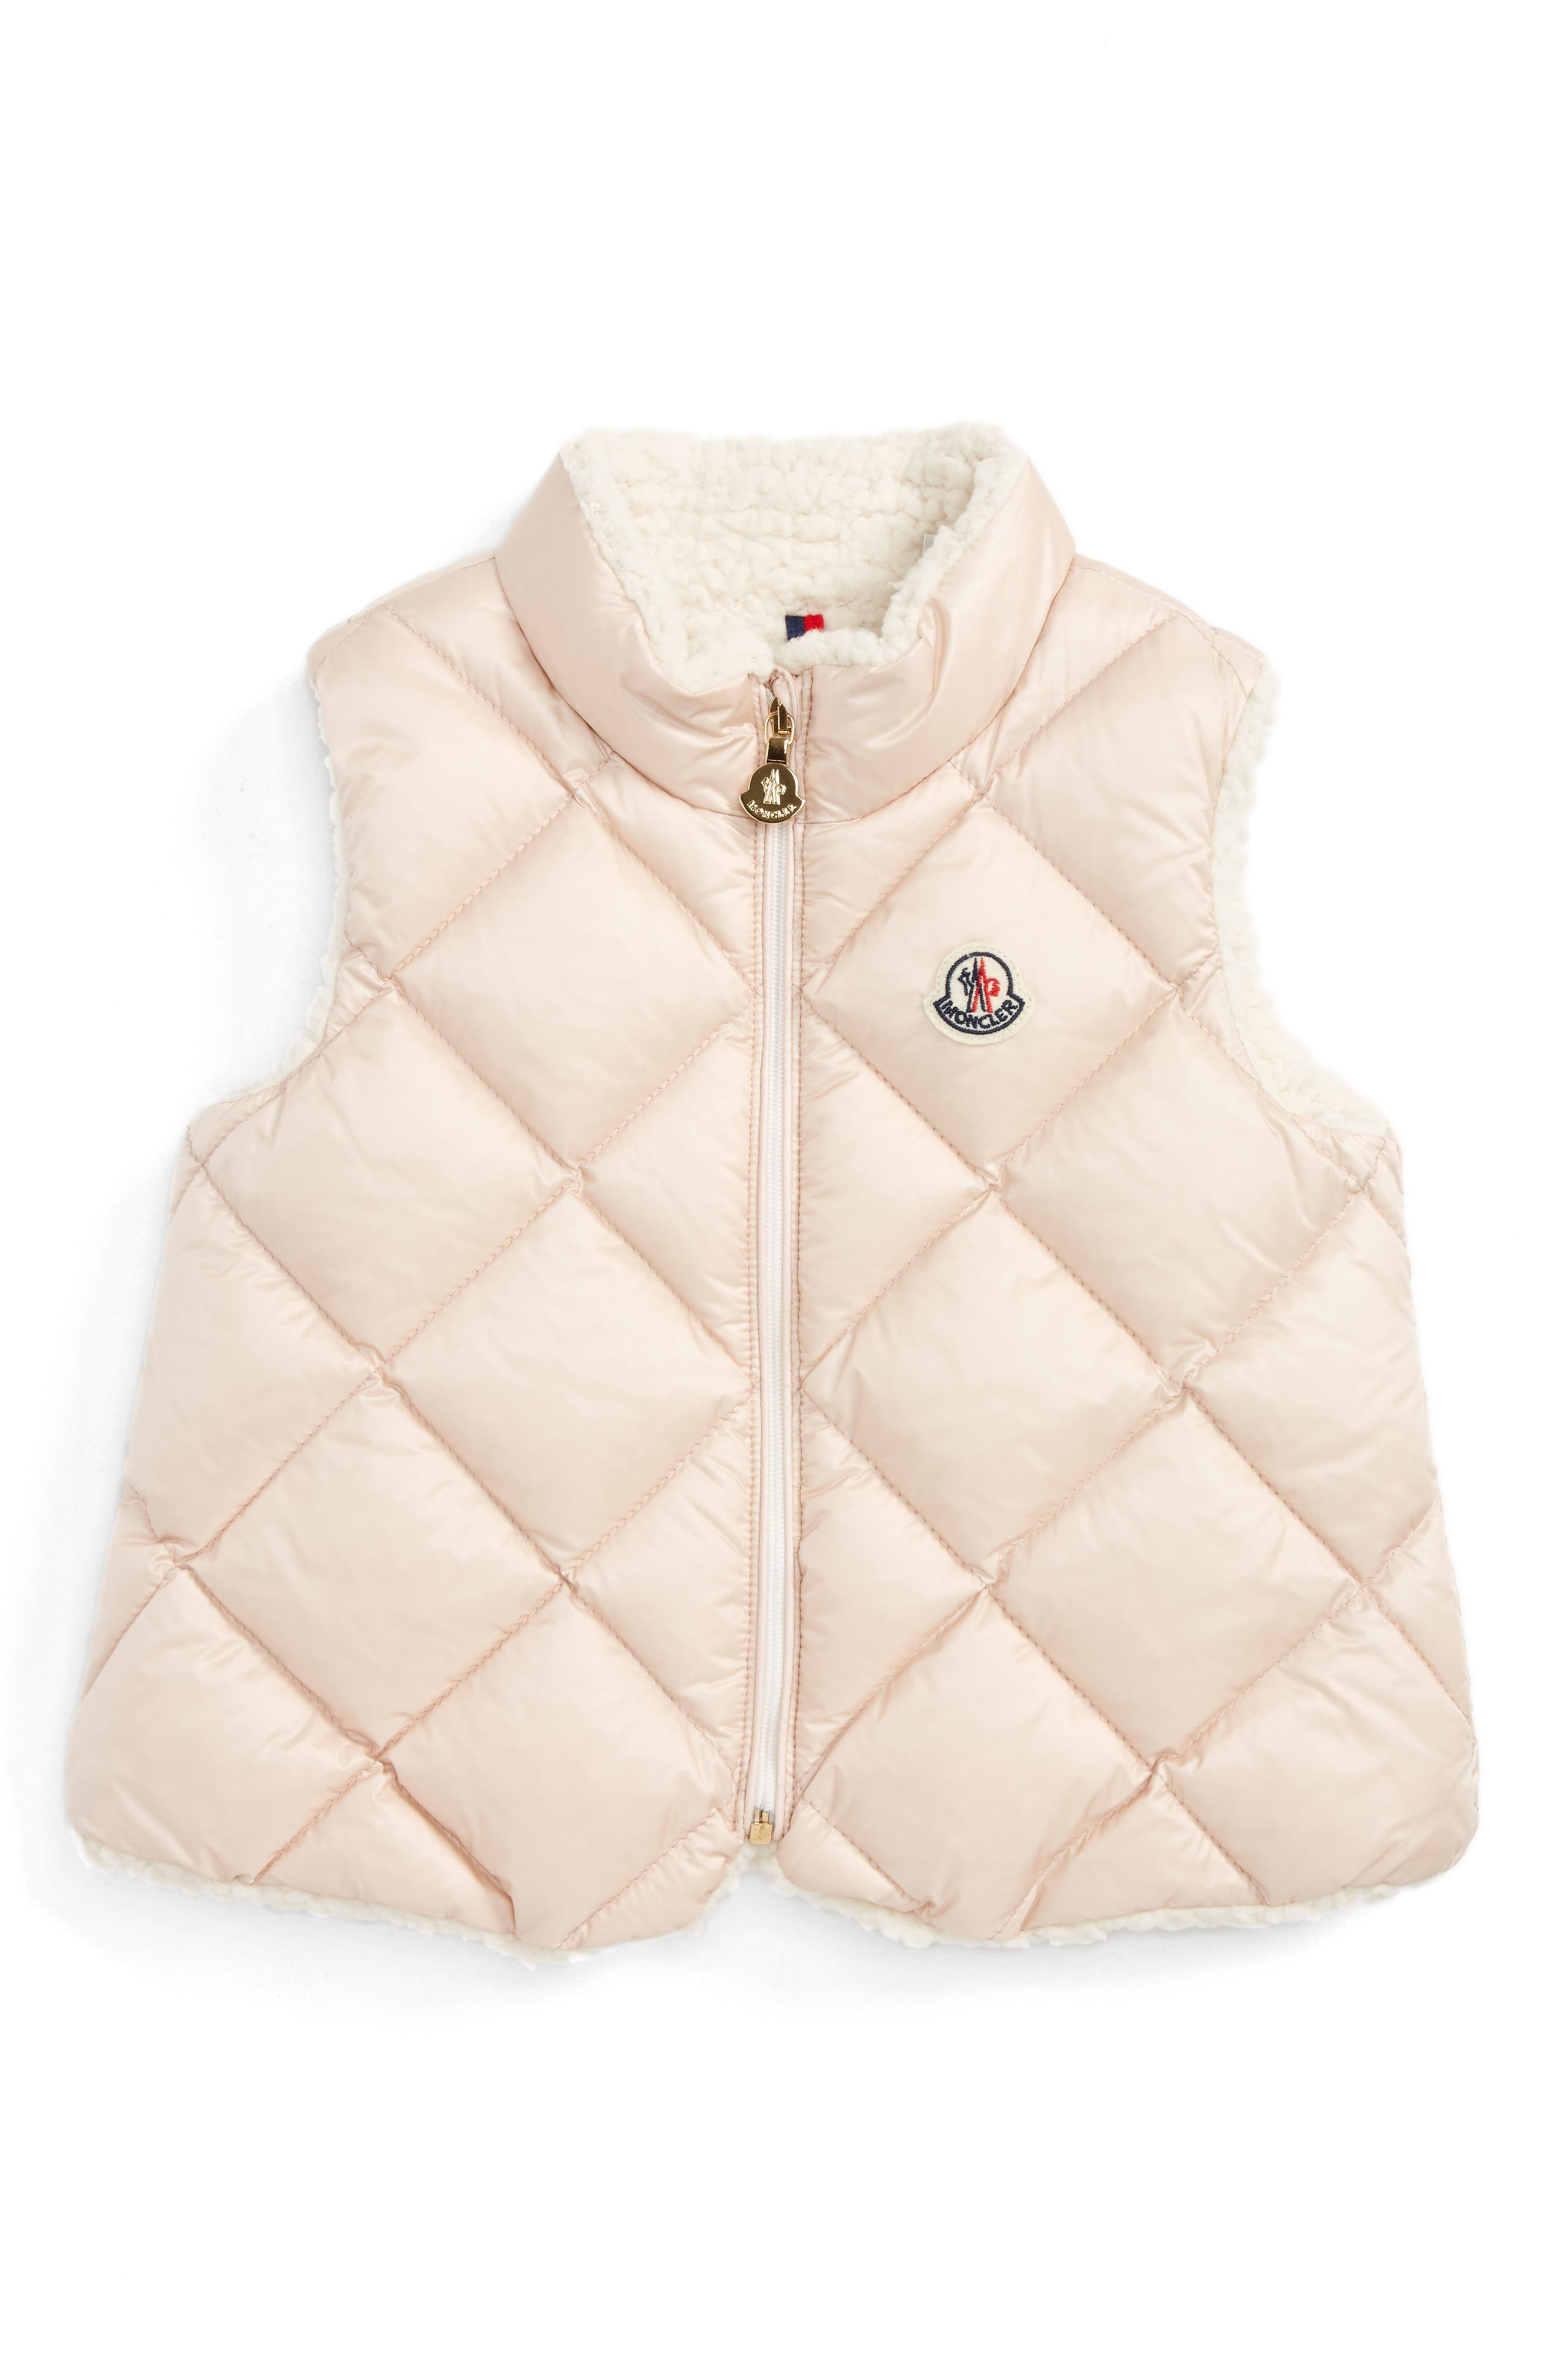 Main Image - Moncler Ysaline Down & Fleece Lined Vest (Baby Girls & Toddler Girls)